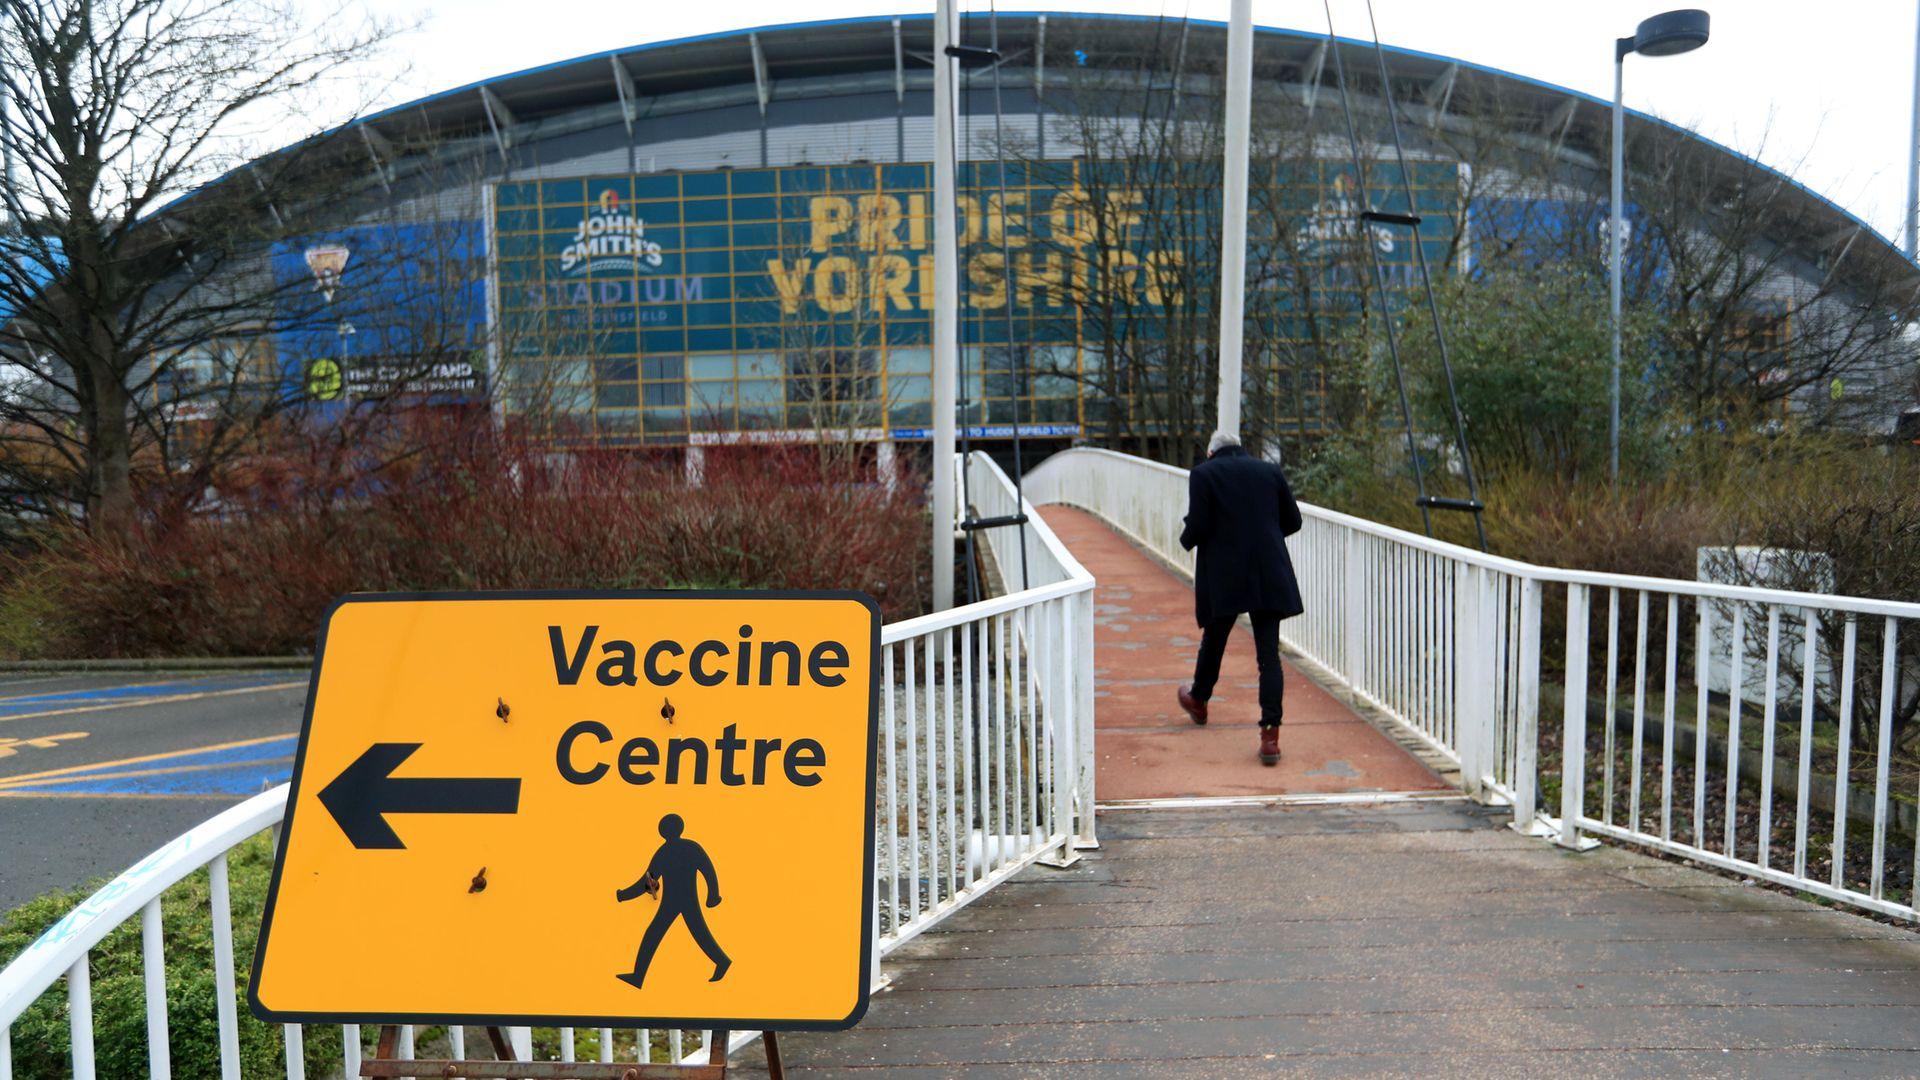 A Vaccine Centre near the John Smith's Stadium, Huddersfield - Credit: PA